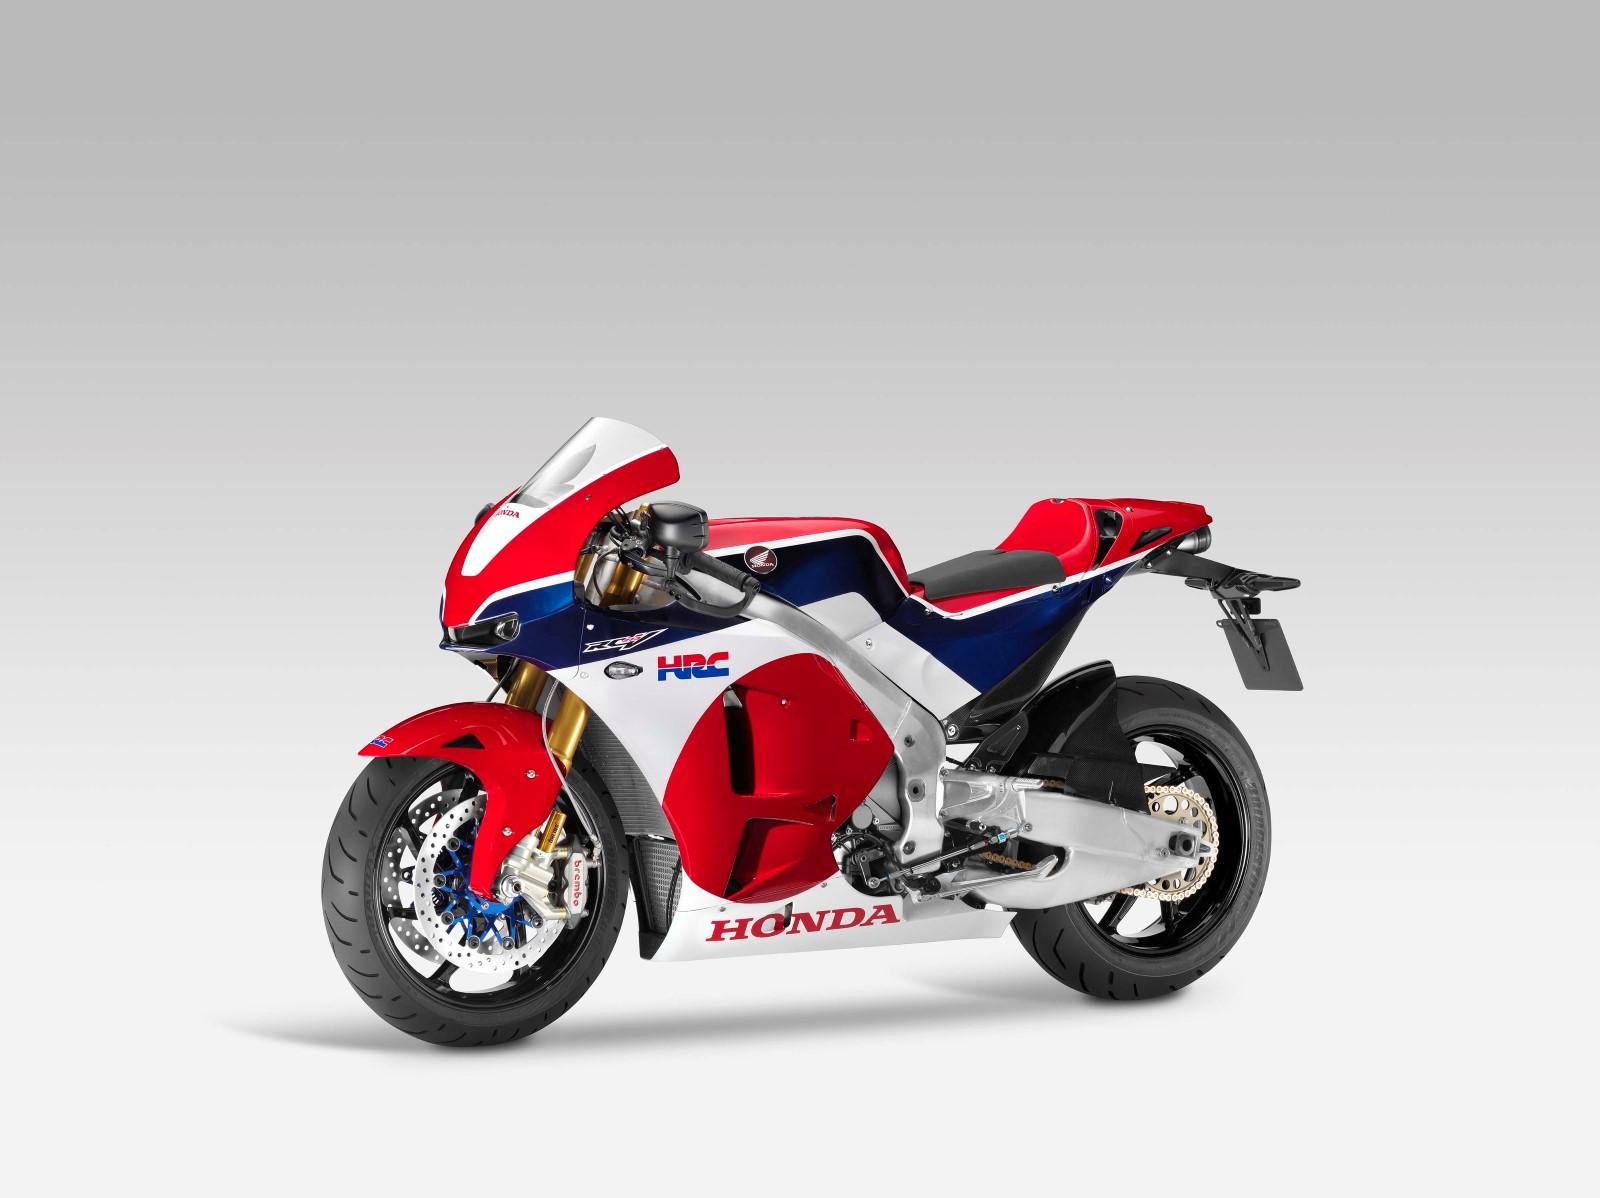 Honda Replica Motorcycle Honda Rc213v-s Motogp Replica